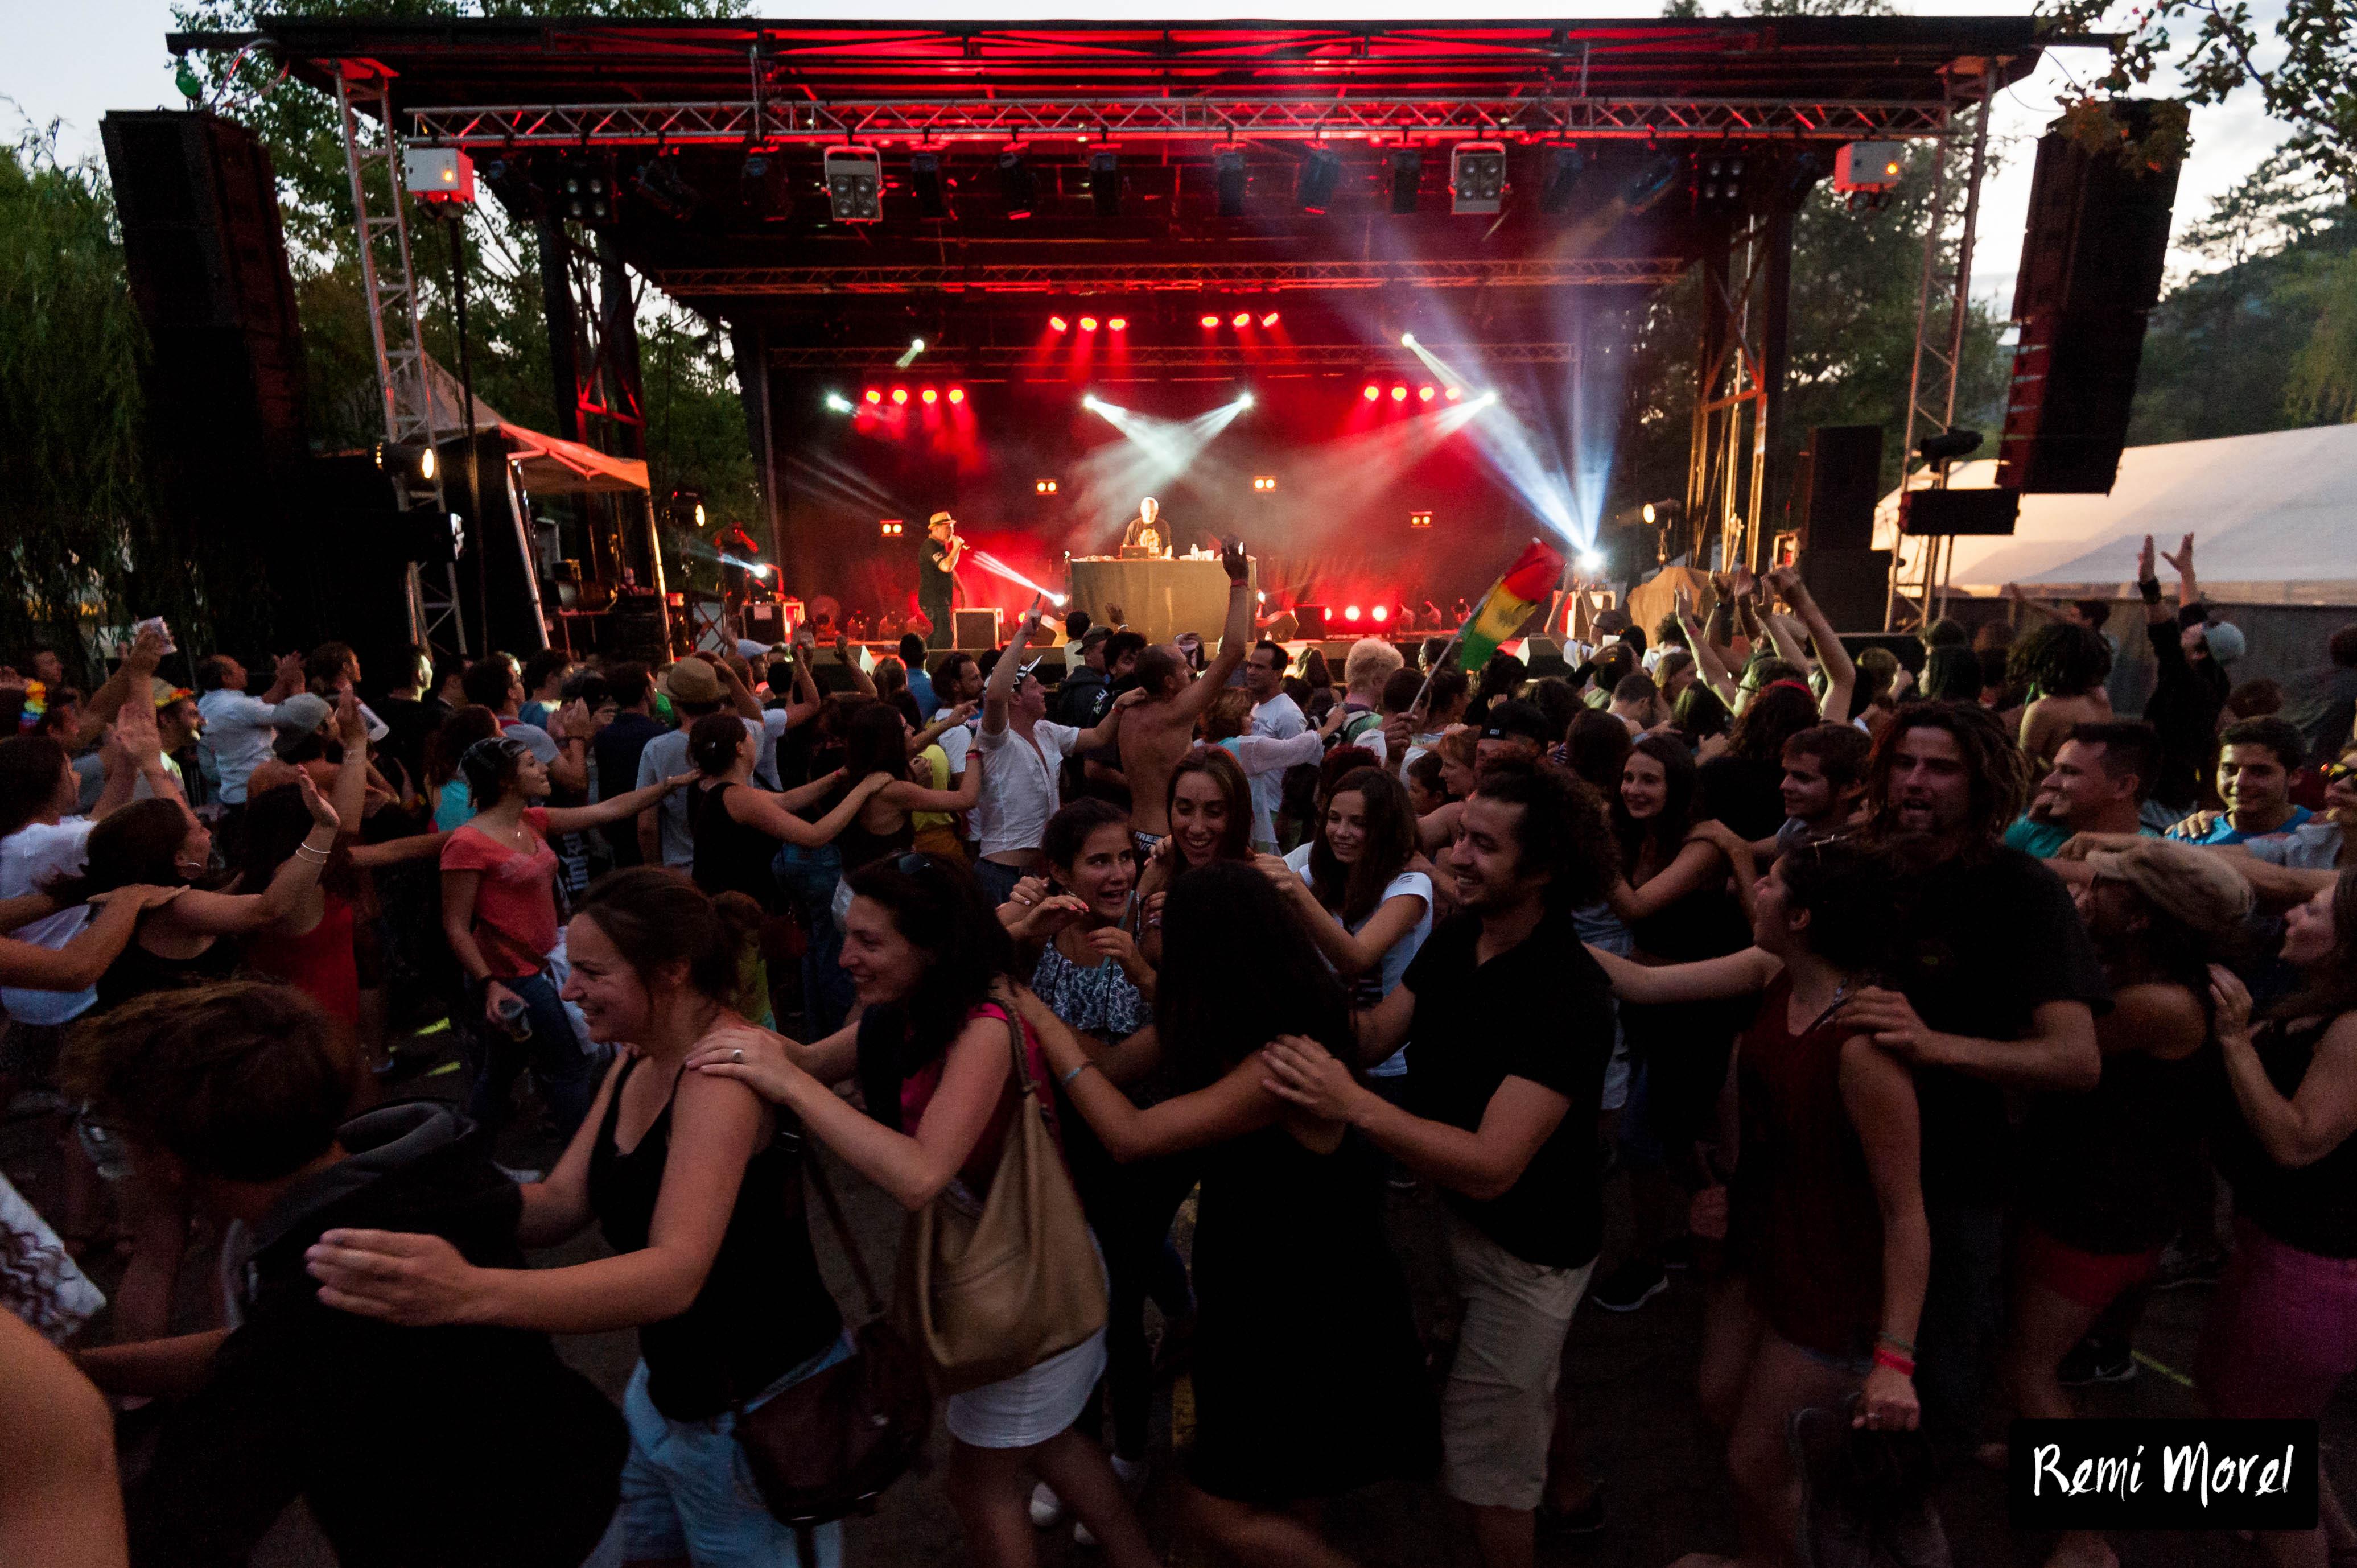 remi-morel-tradin-festival-papet-j-11